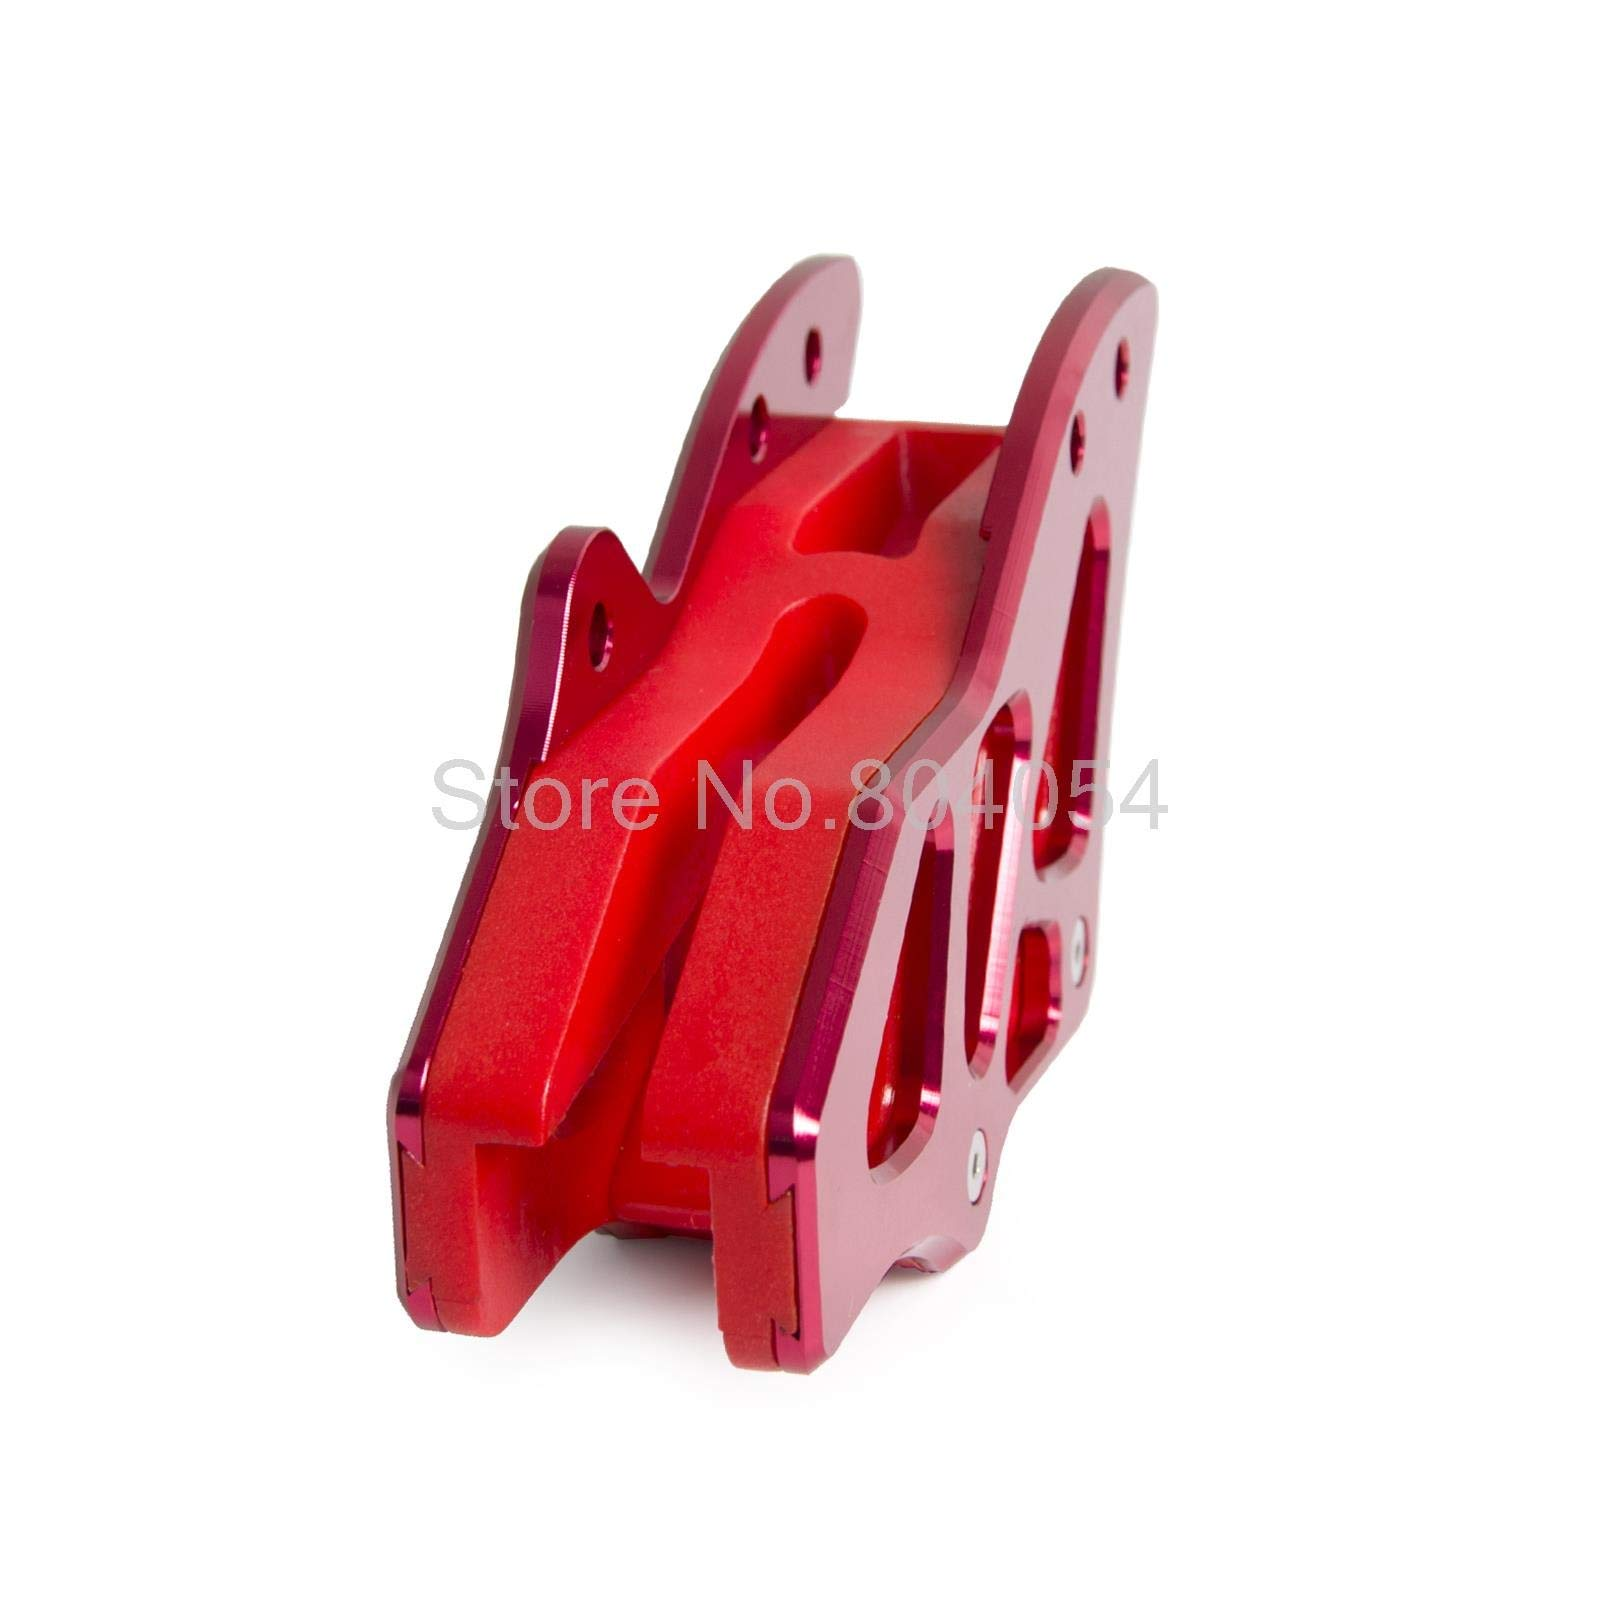 AjaxStore - CNC Billet Anodized Chain Guide Fits Honda CRF250R CRF450R CRF250 R CRF450 R 2005 2006 CRF250X 2006